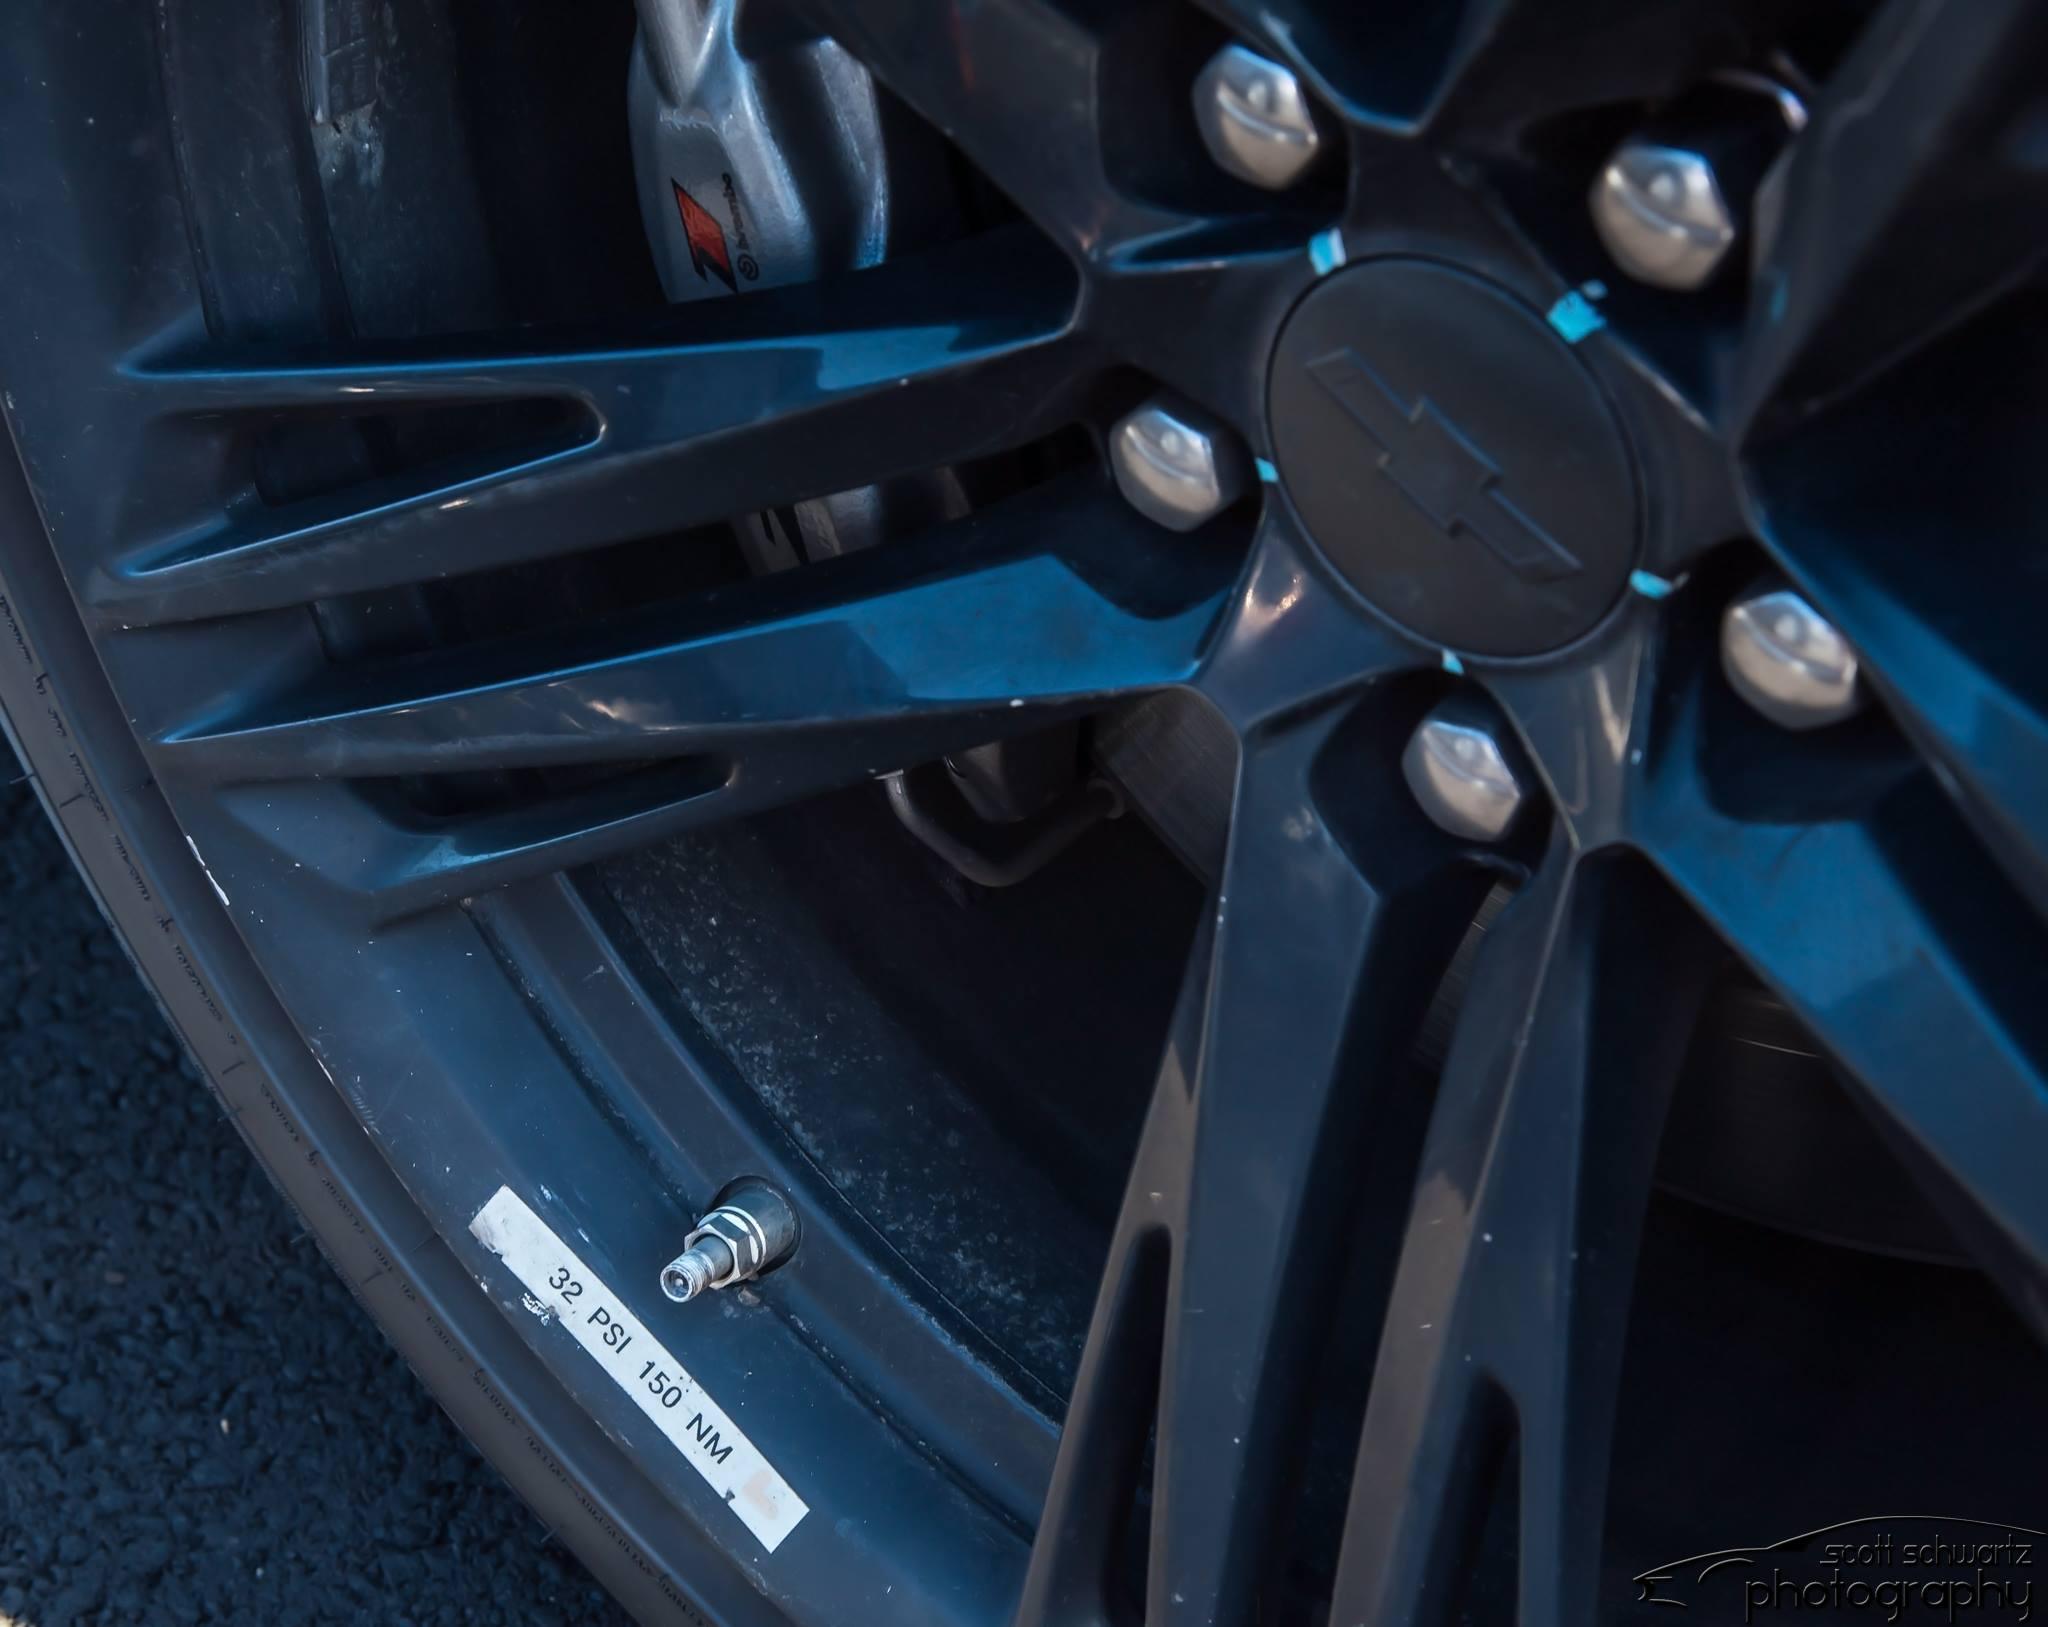 Camaro ZL1 1LE - Wheel.jpg